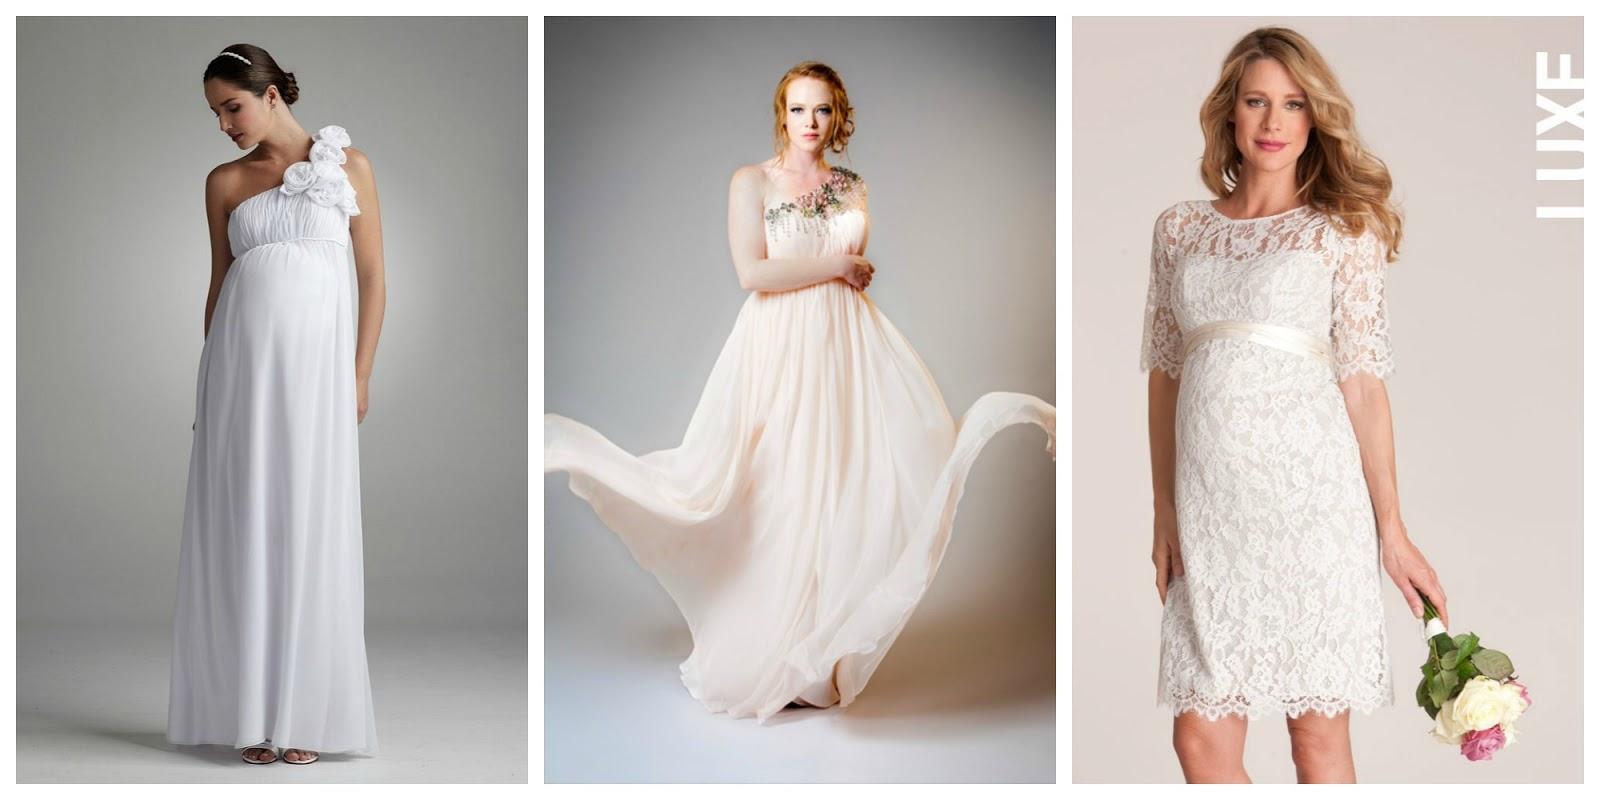 wedding wednesday maternity wedding maternity wedding guest dresses Wedding Wednesday Maternity Wedding Fashion Guest Post